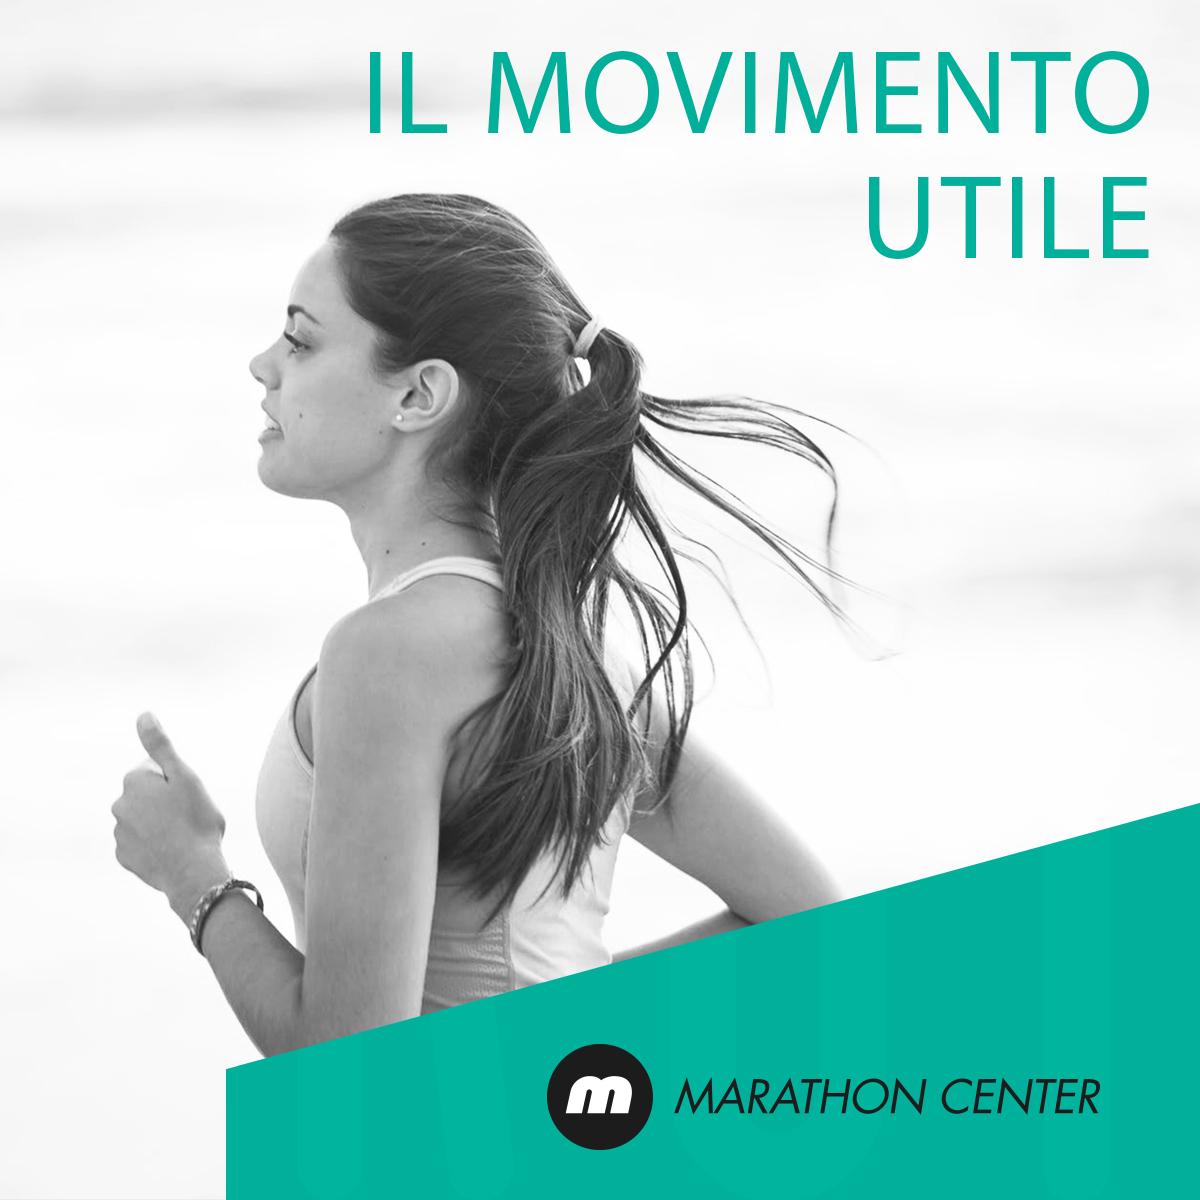 marathon-medical-center-movimento-utile